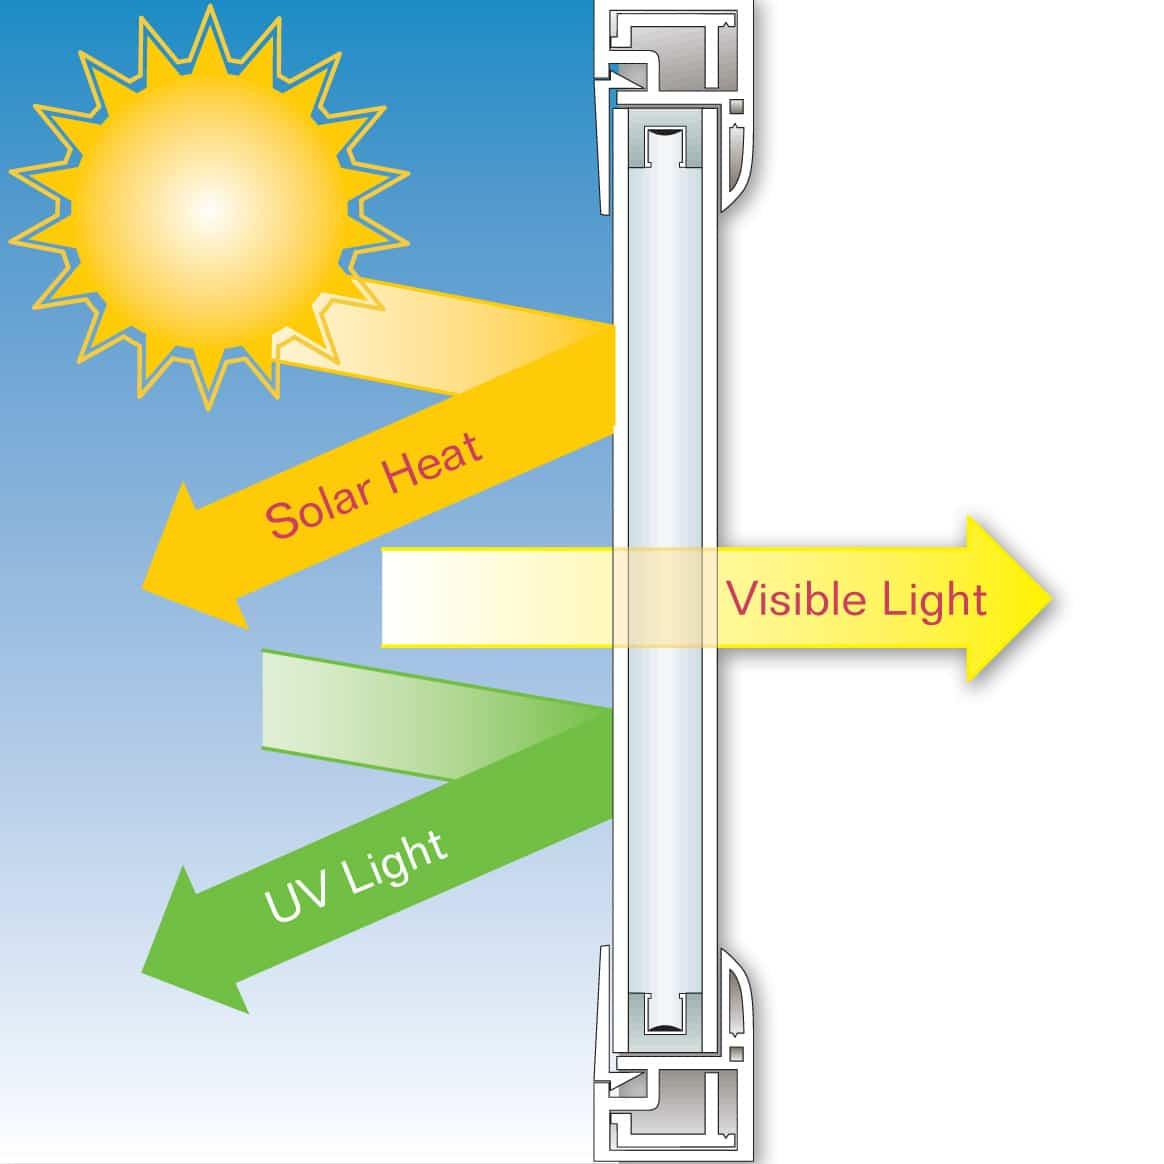 uv lights directions - stuart impact windows